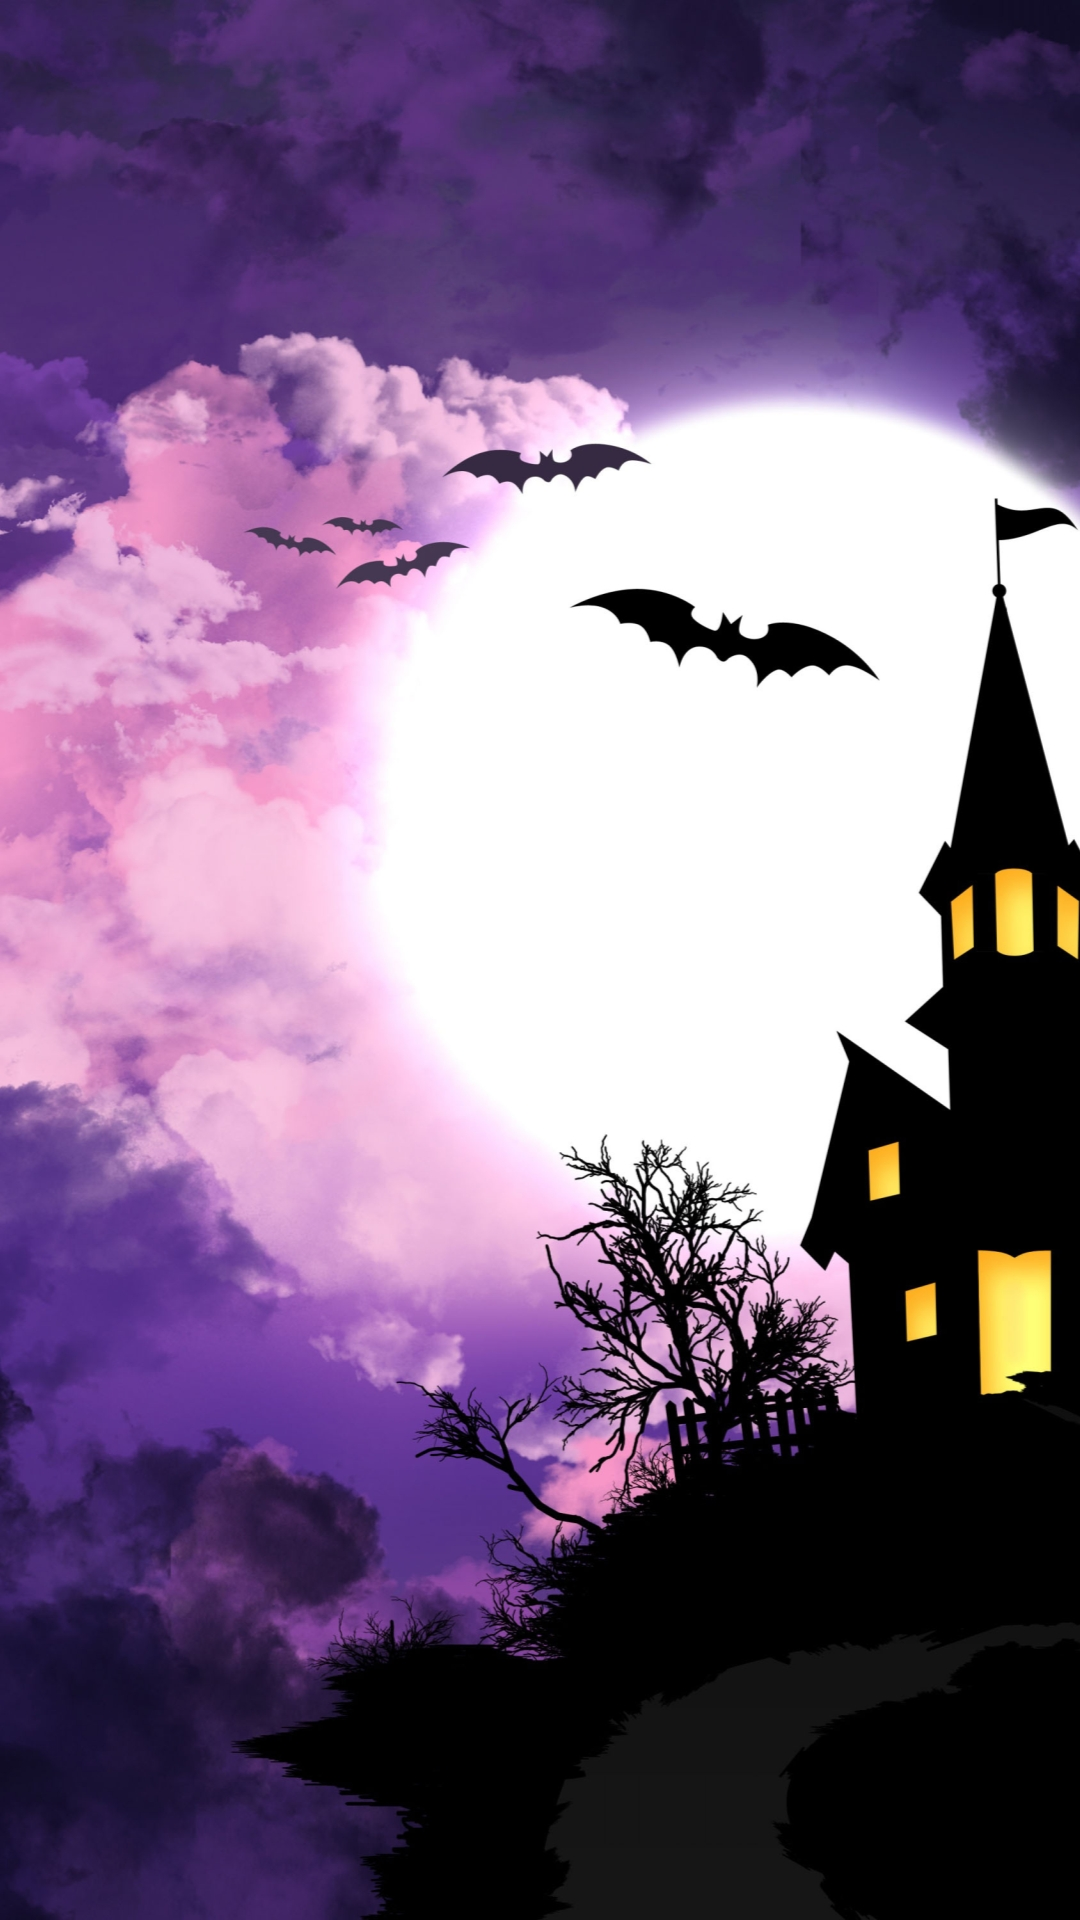 Fondos Halloween Wallpapers Mobile on Dibujos Para Imprimir Gratis